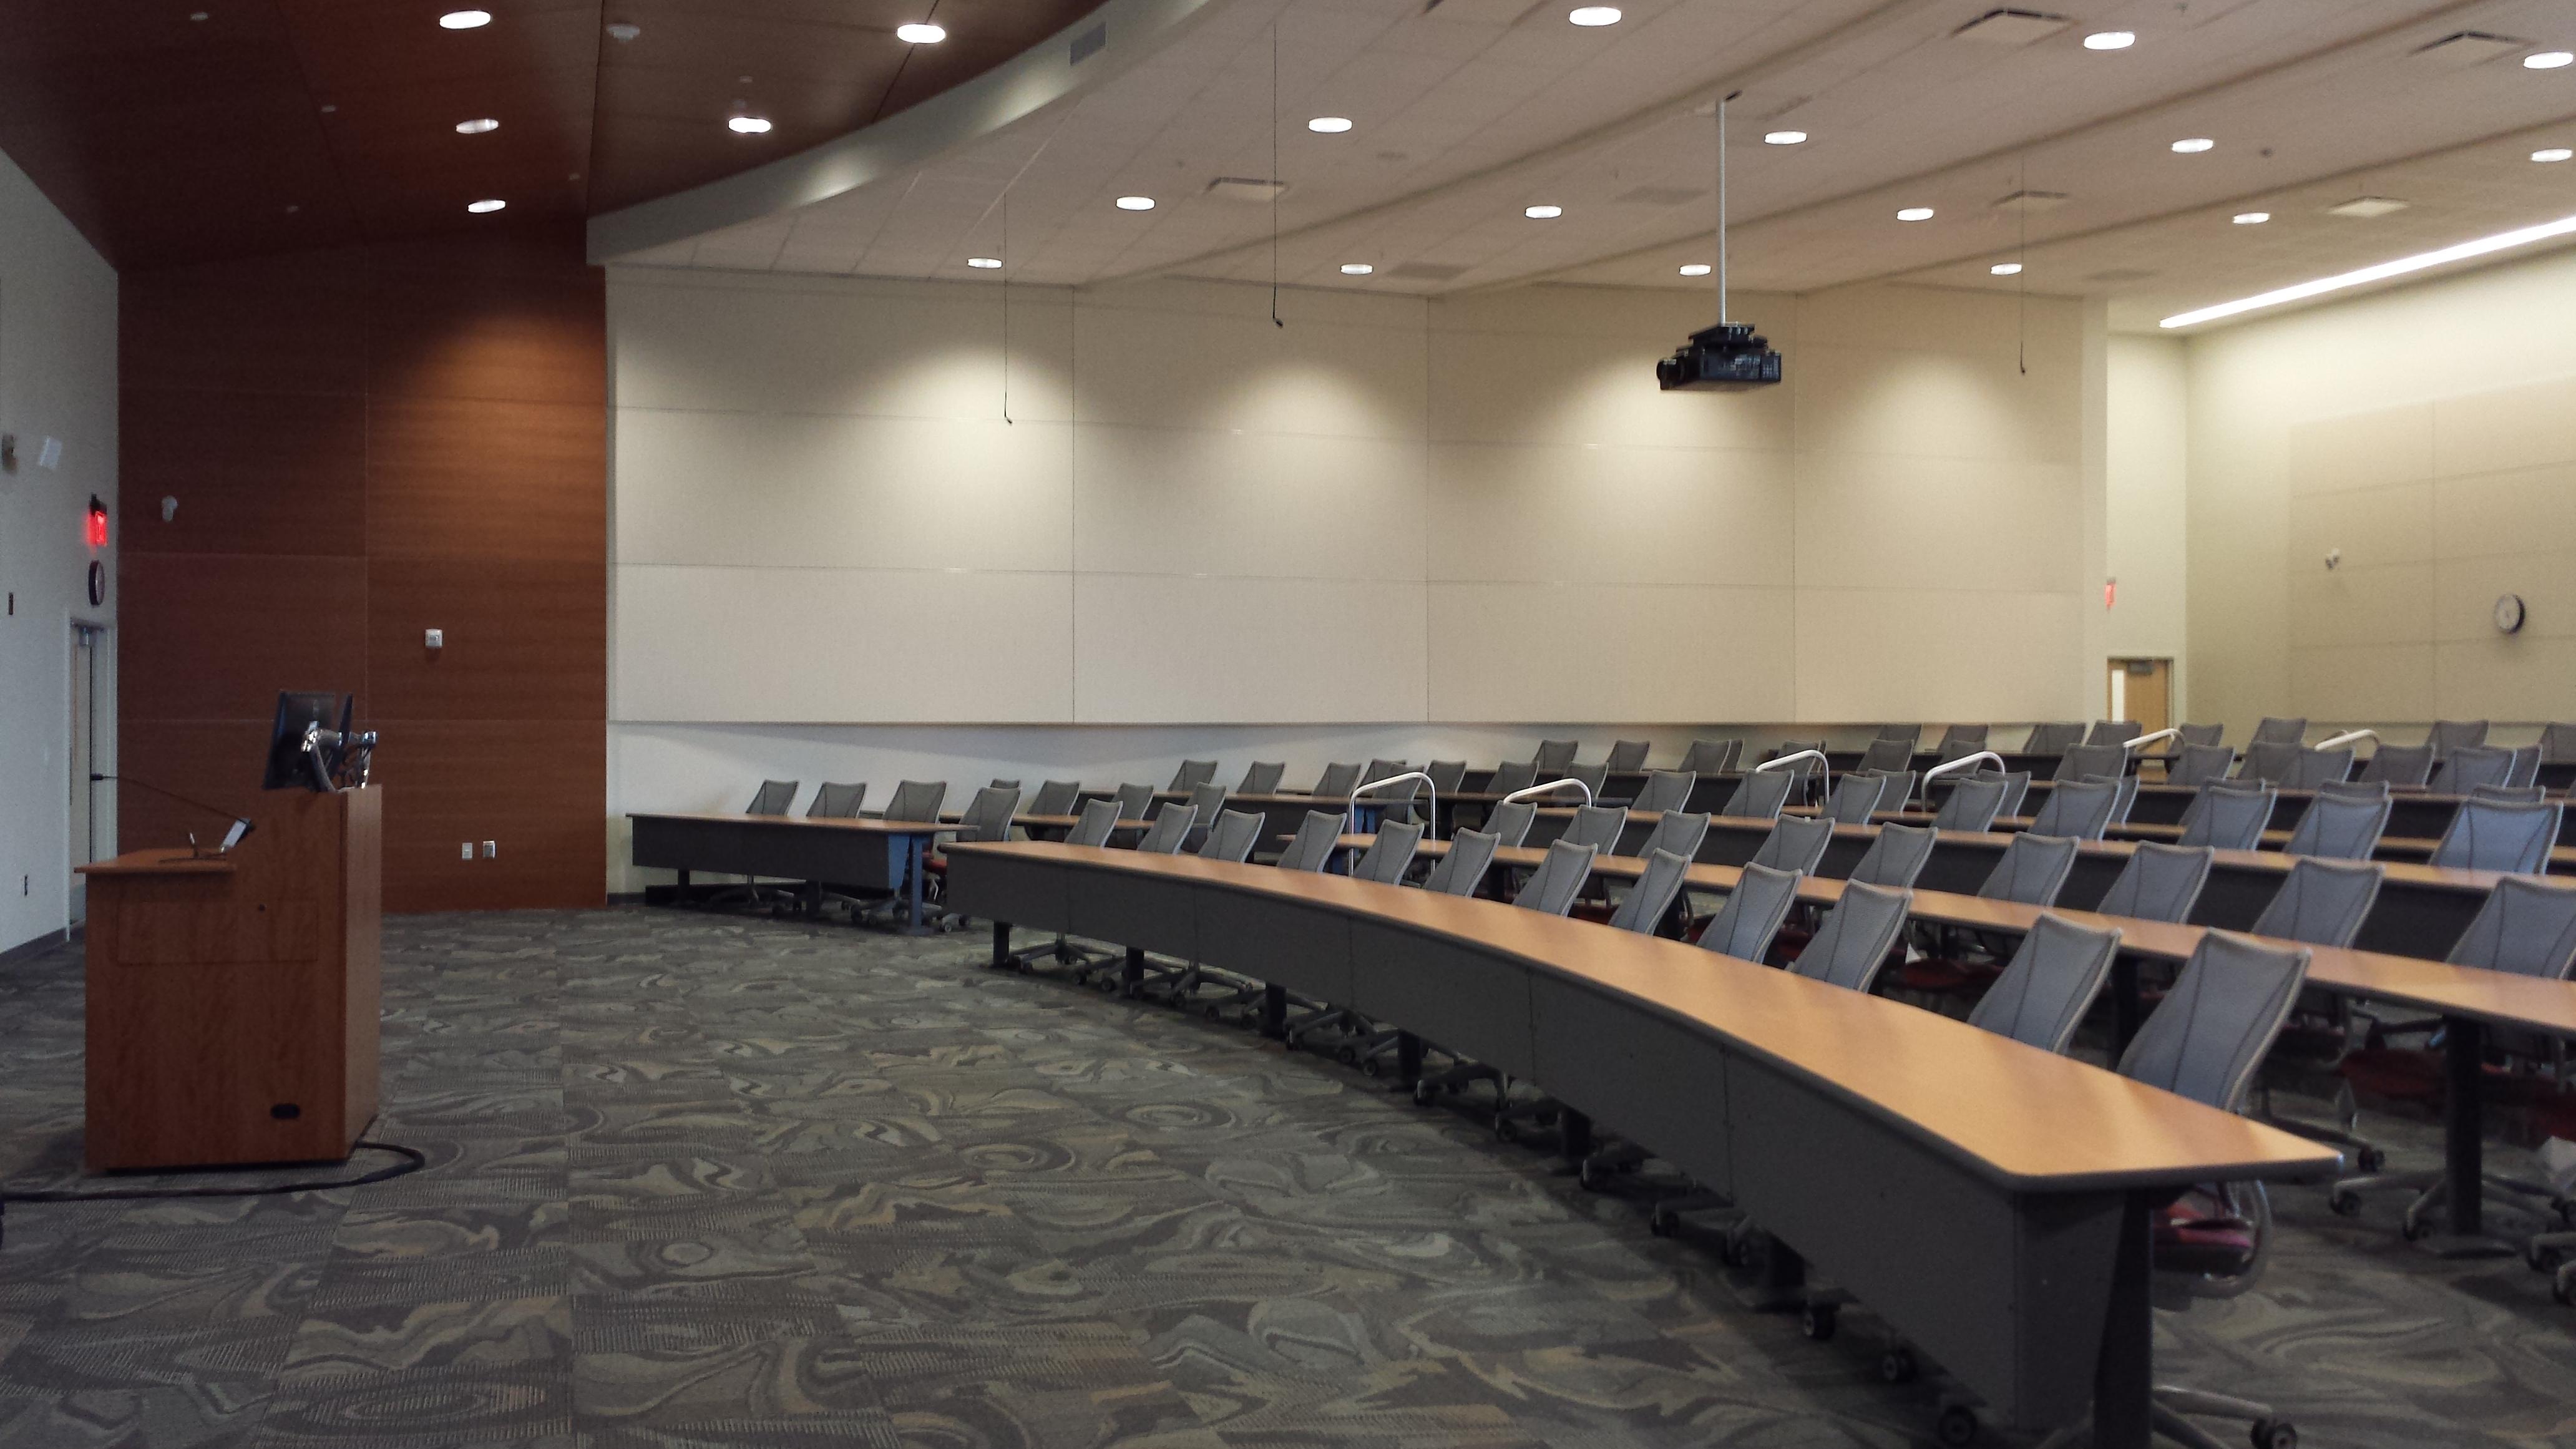 Veterinary medicine learning center university architects - Lloyds architecture planning interiors ...